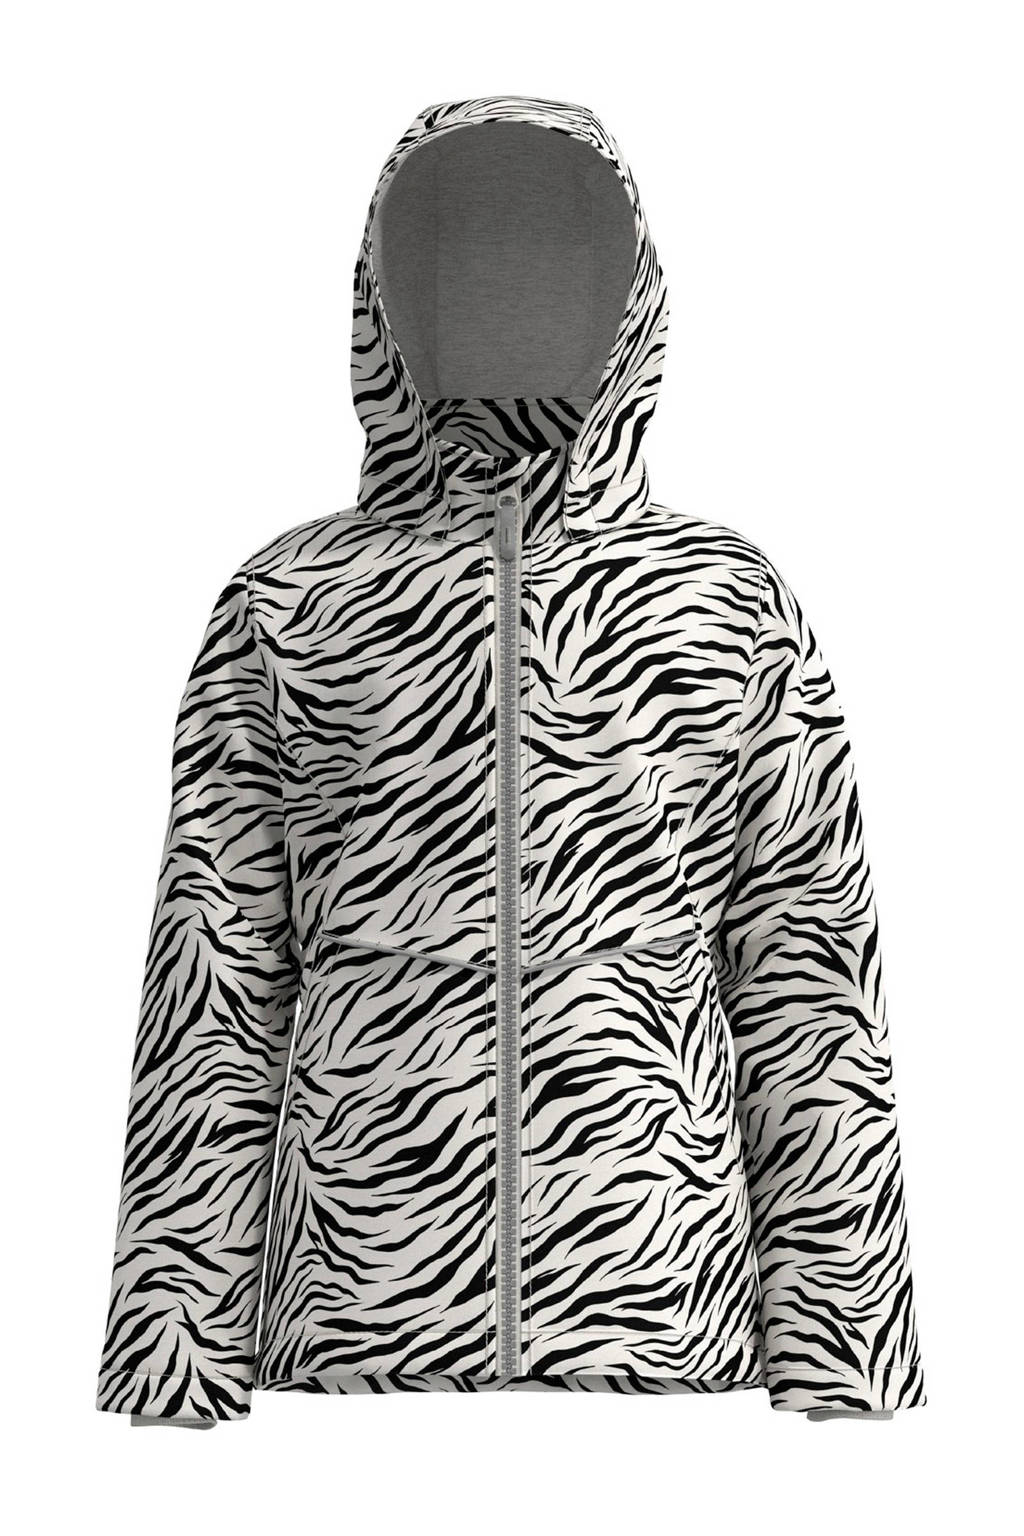 NAME IT KIDS jas Maxi met zebraprint wit/zwart, Wit/zwart